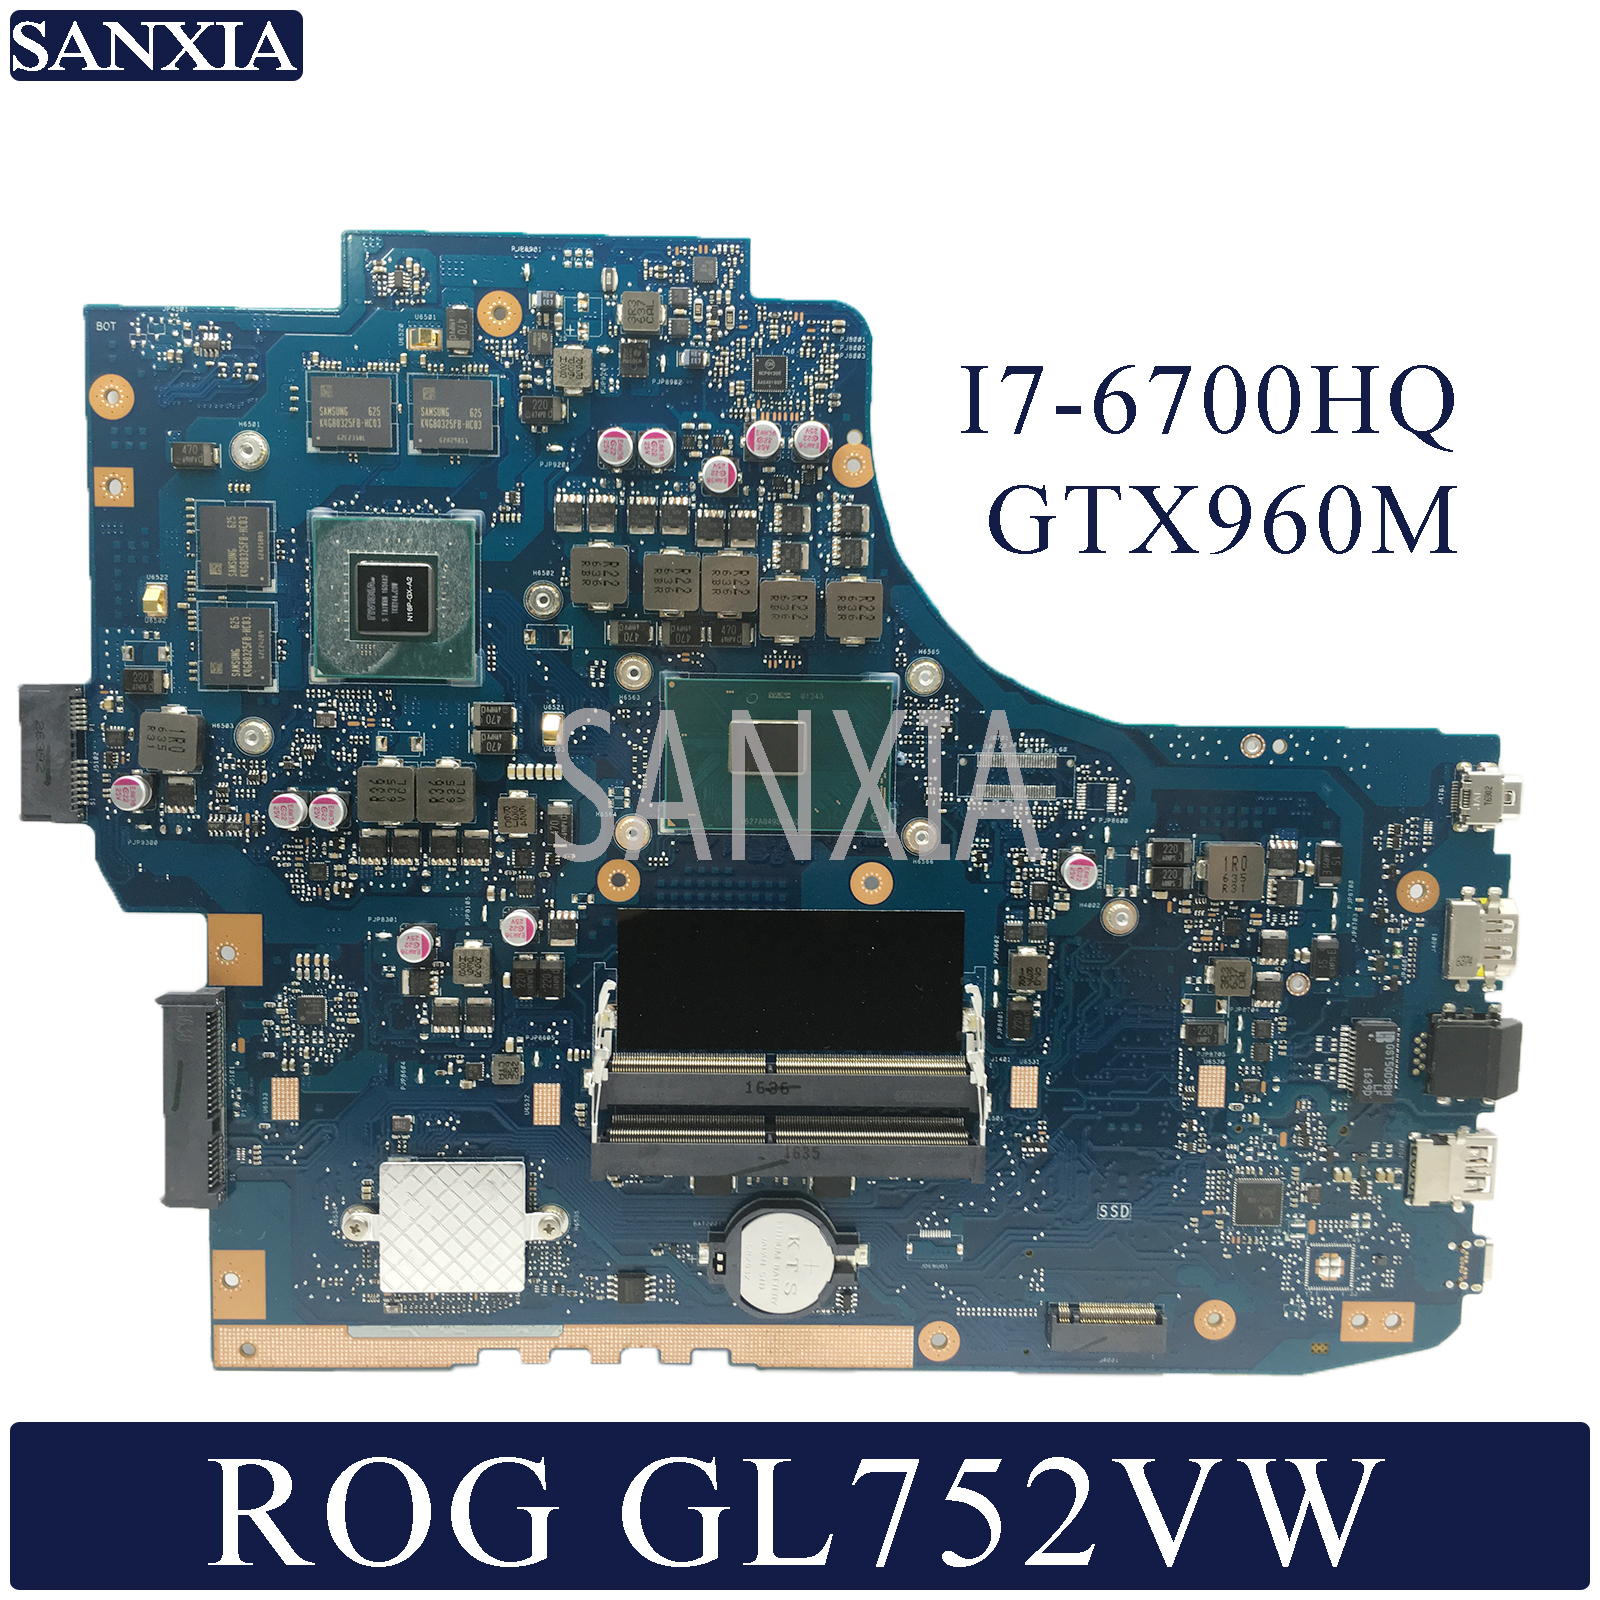 KEFU Laptop motherboard for ASUS ROG GL752VW original mainboard HM170 I7 6700HQ GTX960M 2GB 4GB